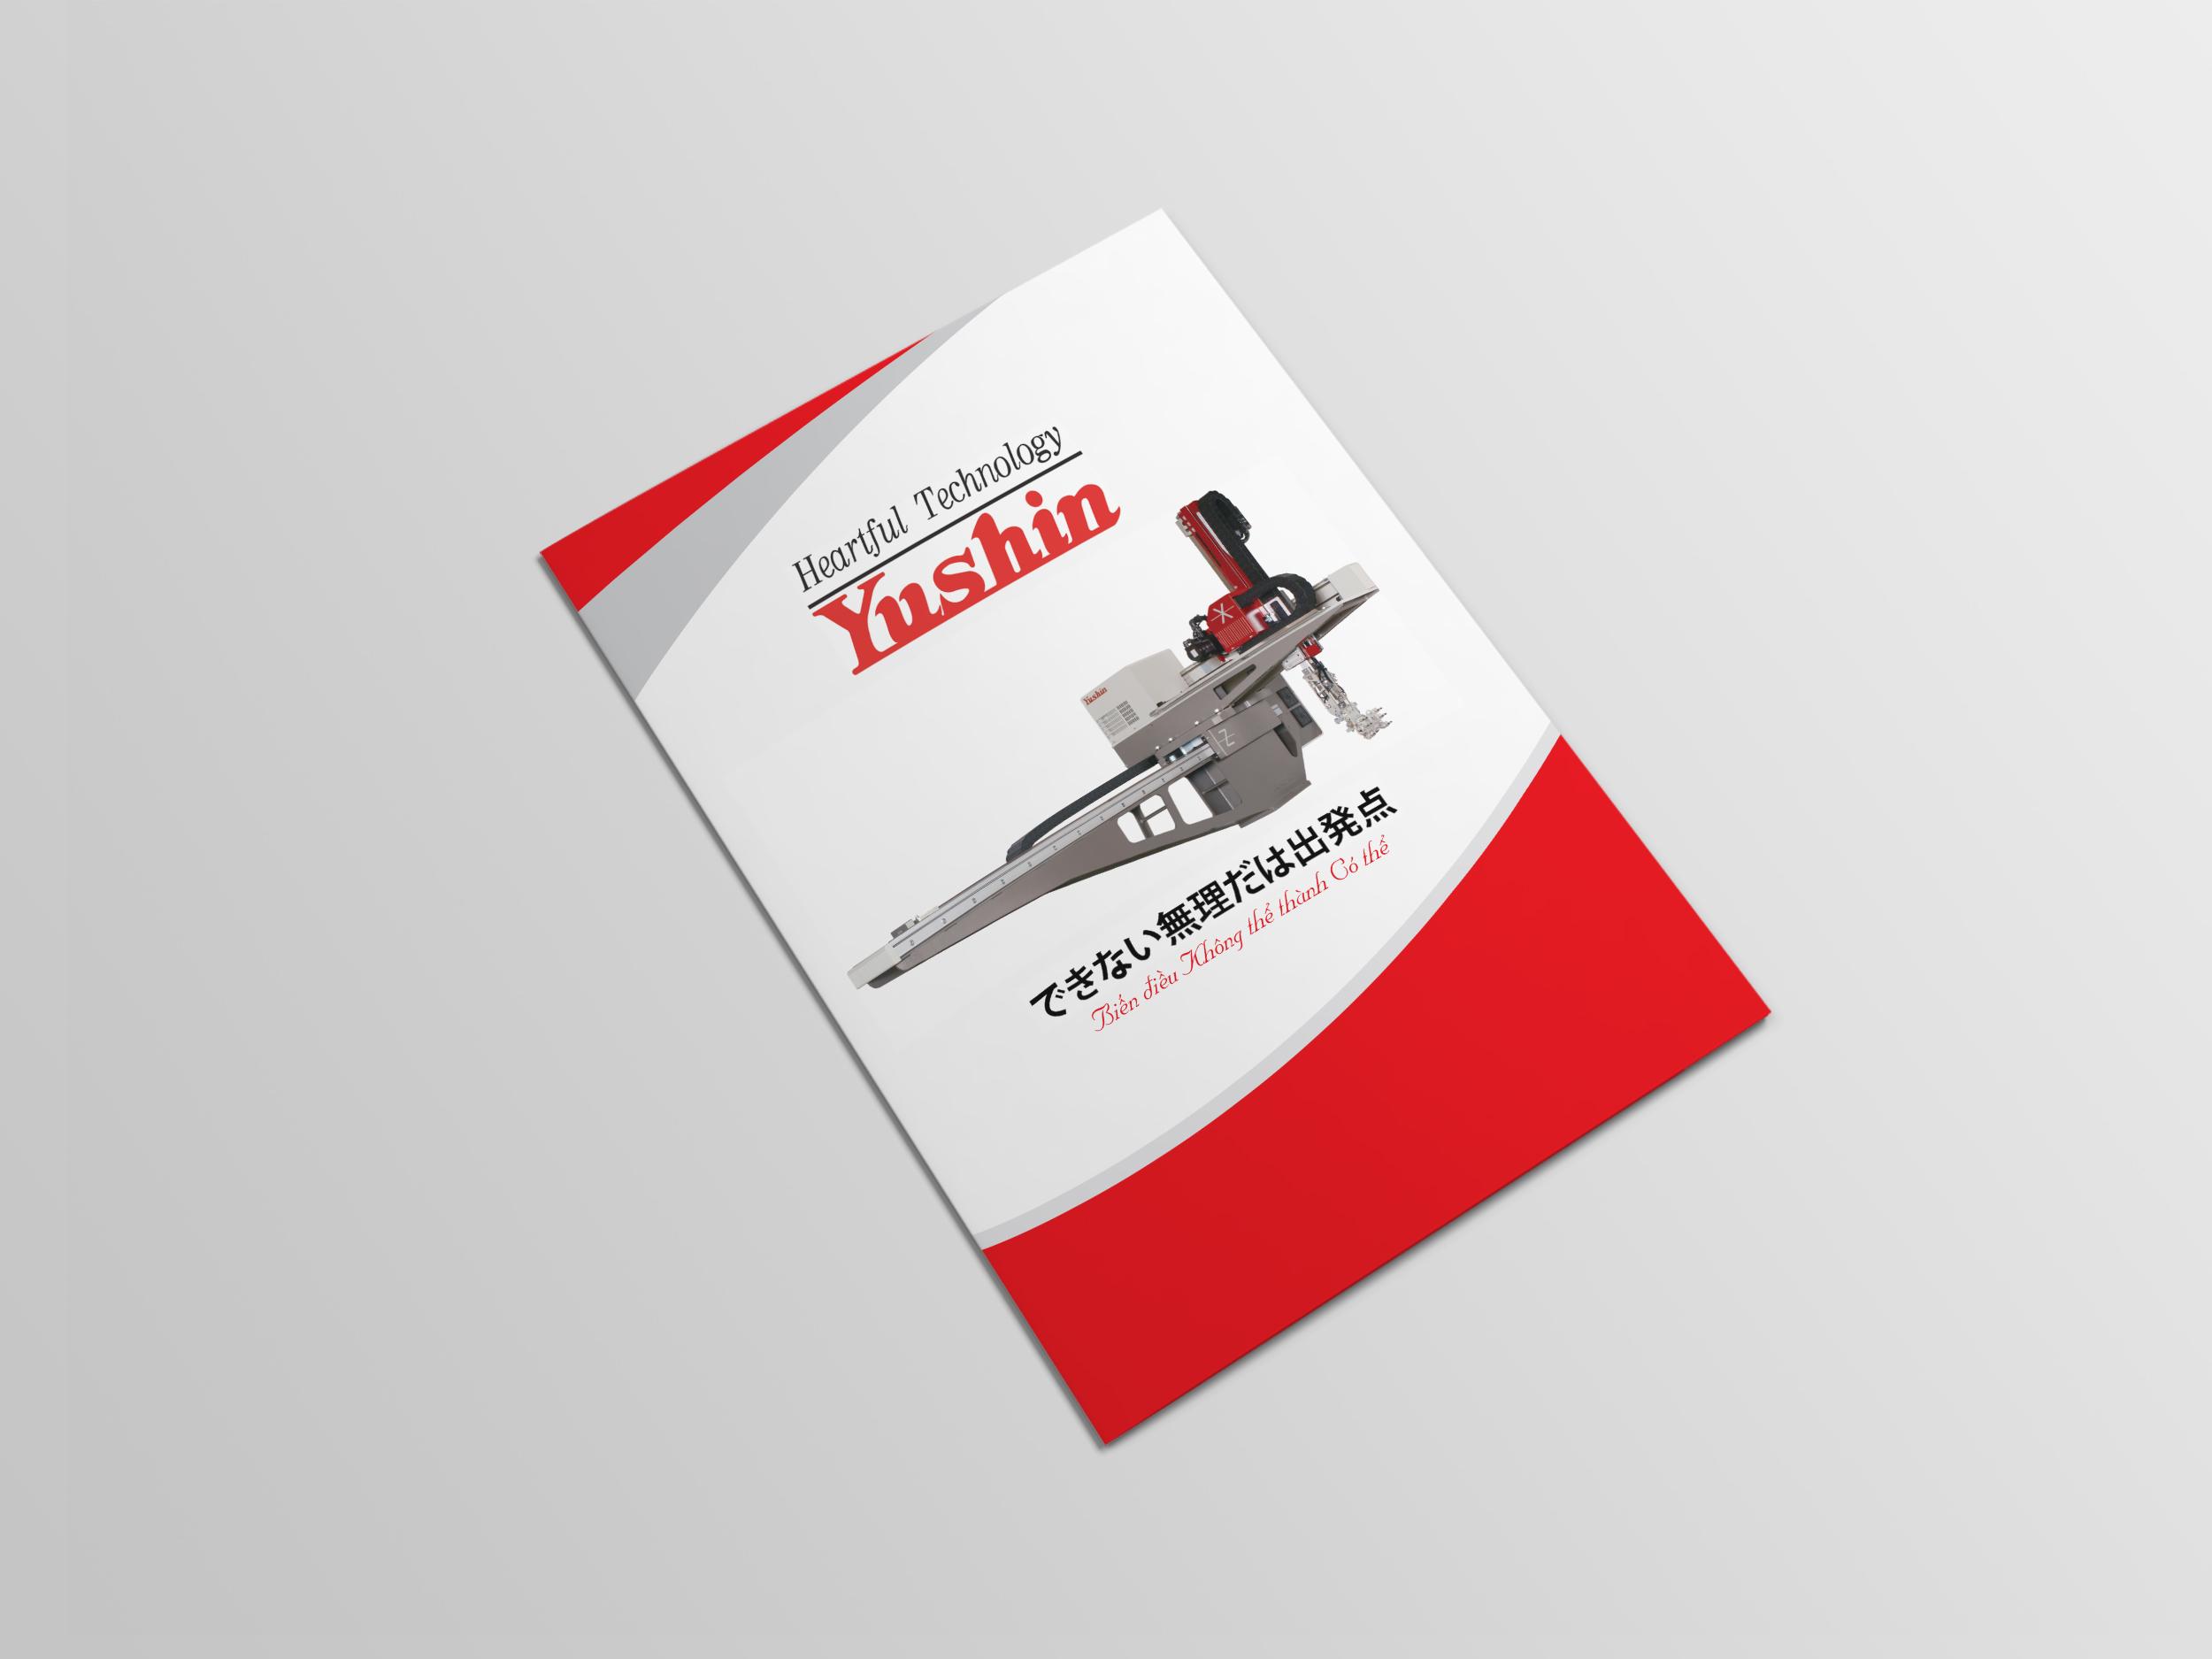 Yushin7